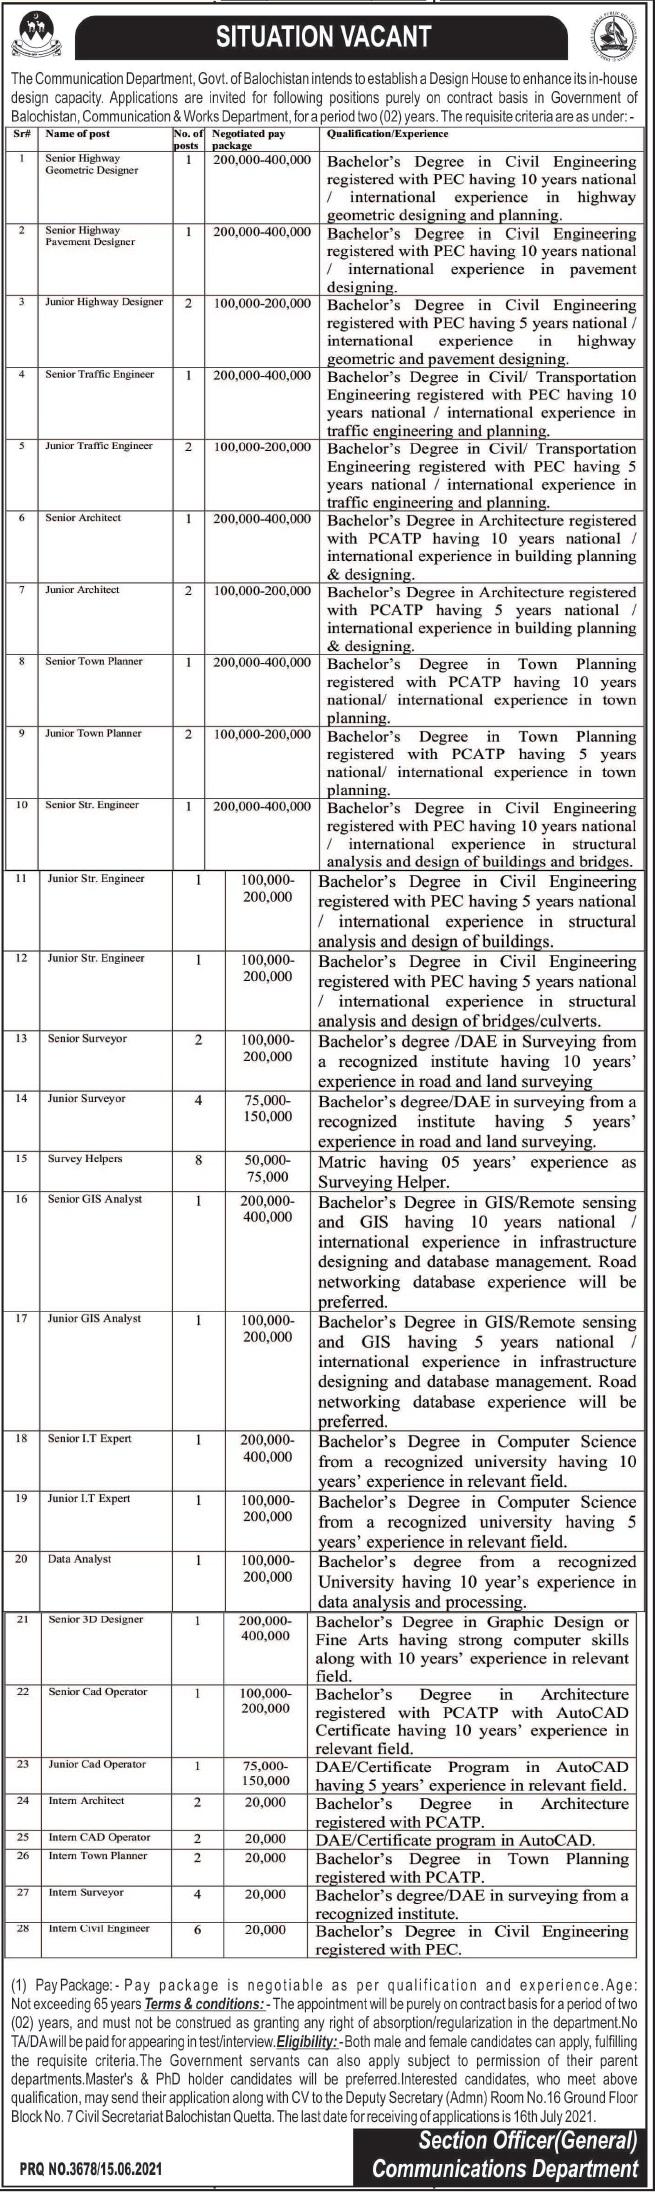 Communication & Works Department Pakistan C&W Jobs 2021